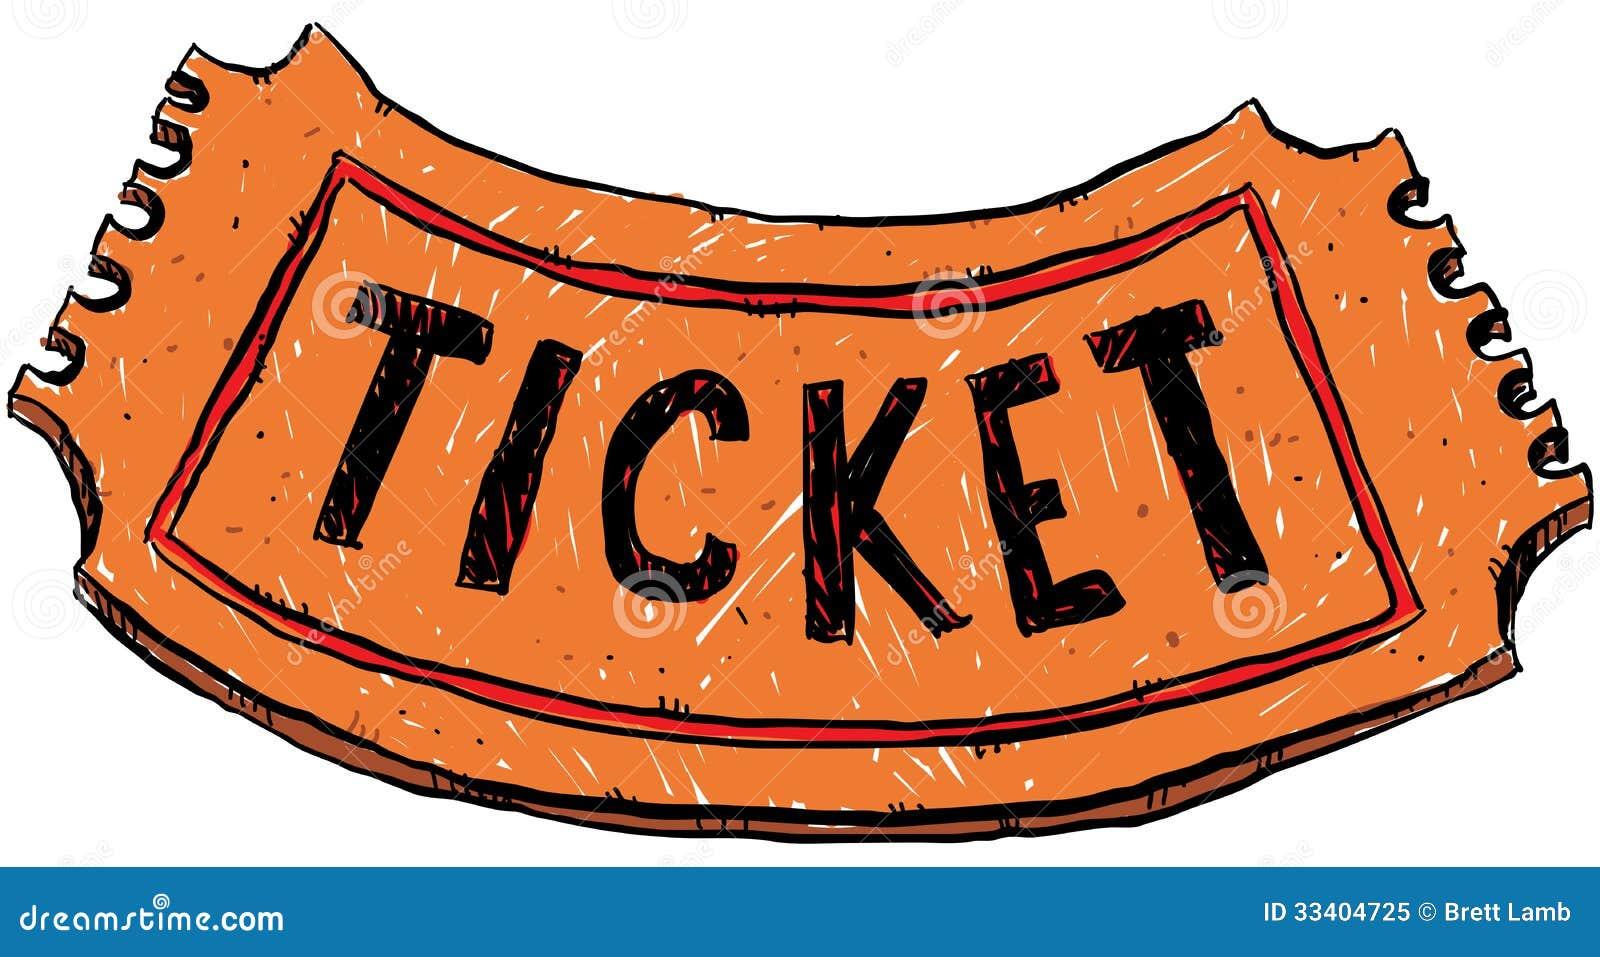 Cartoon Ticket Royalty Free Stock Photo - Image: 33404725